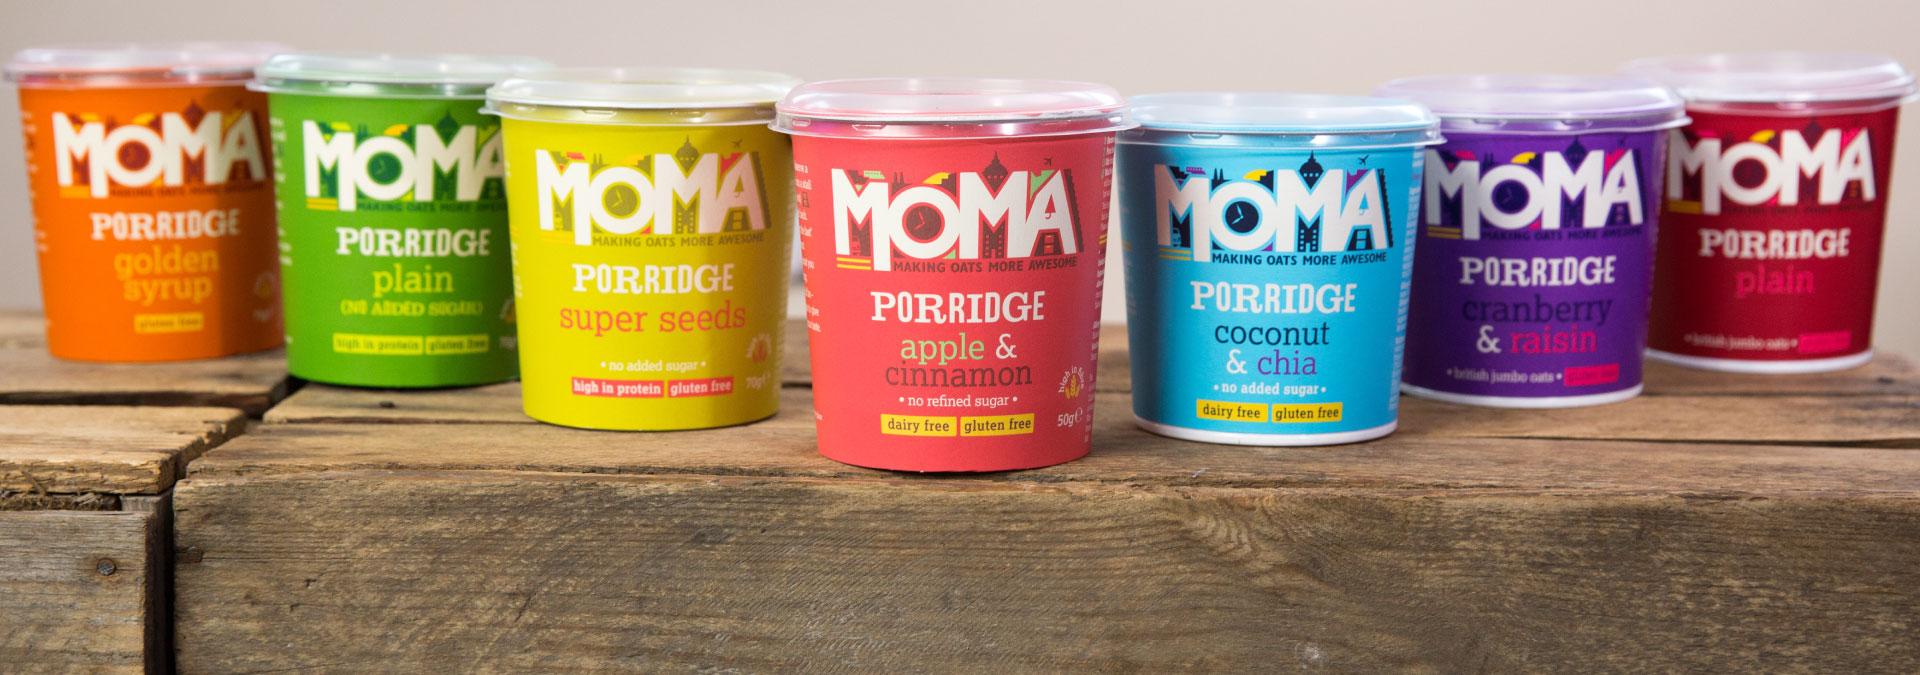 moma-gluten-free-porridge-dairy-free-pots